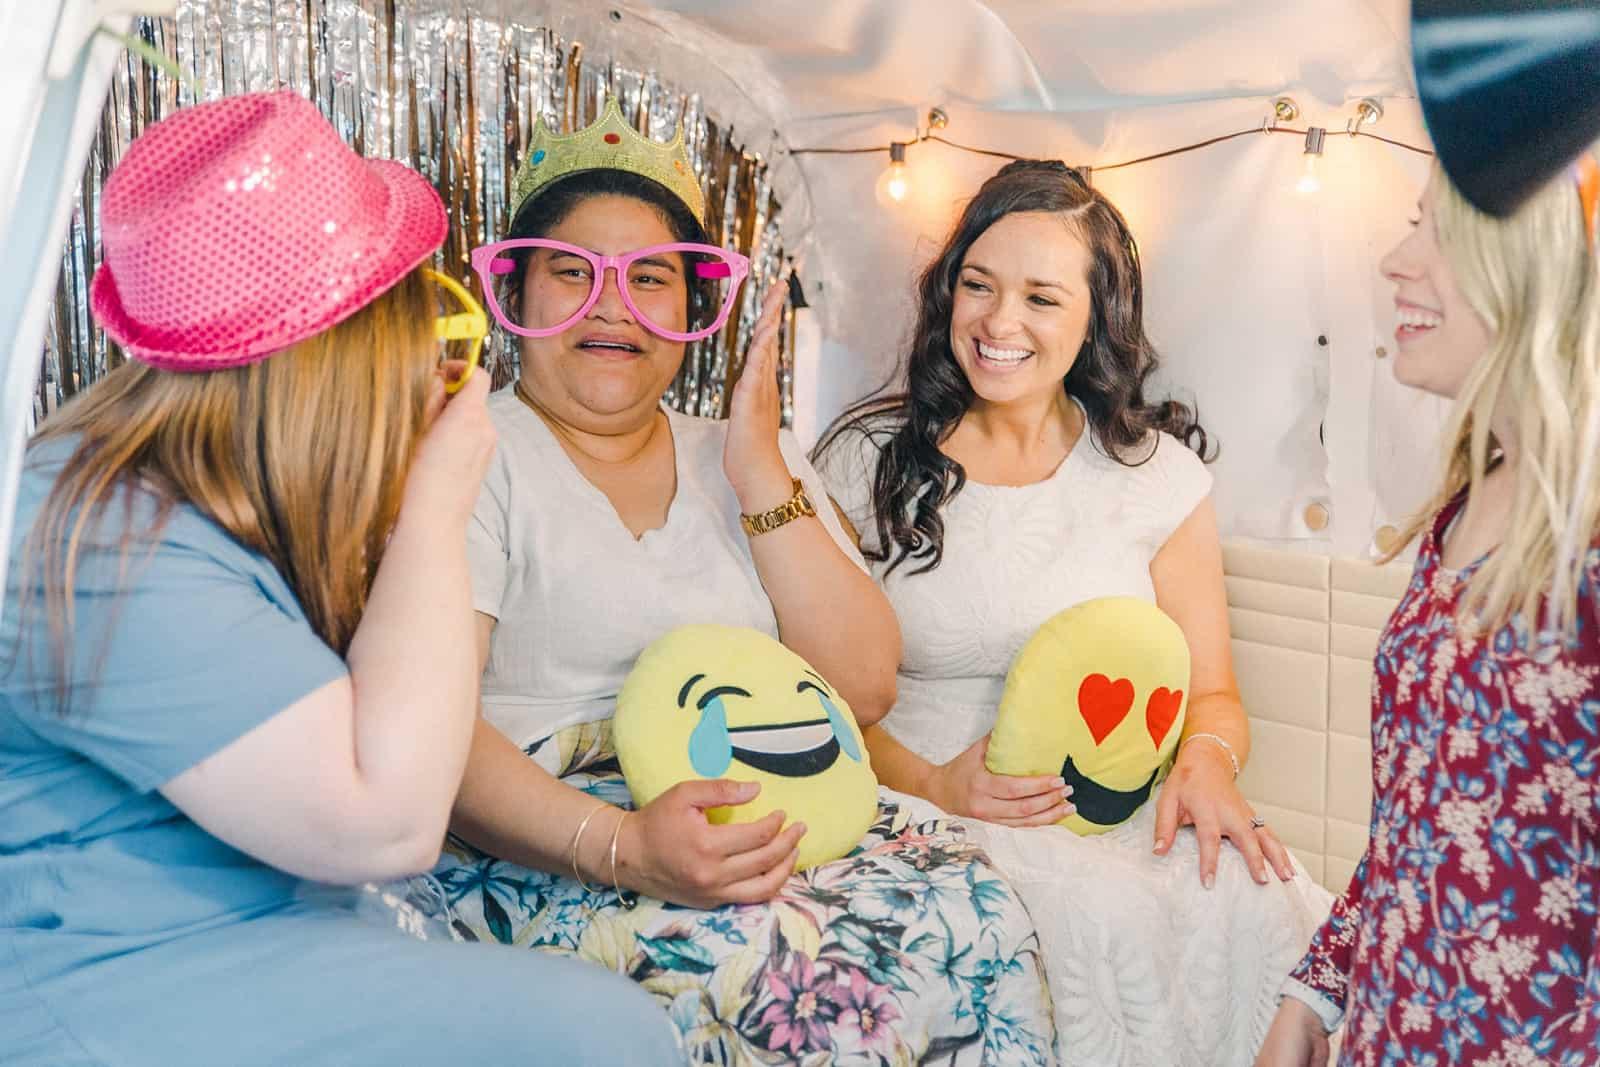 Thomas S. Monson Center Wedding, Salt Lake LDS Temple Wedding, Utah wedding photography, photo booth with props emojis